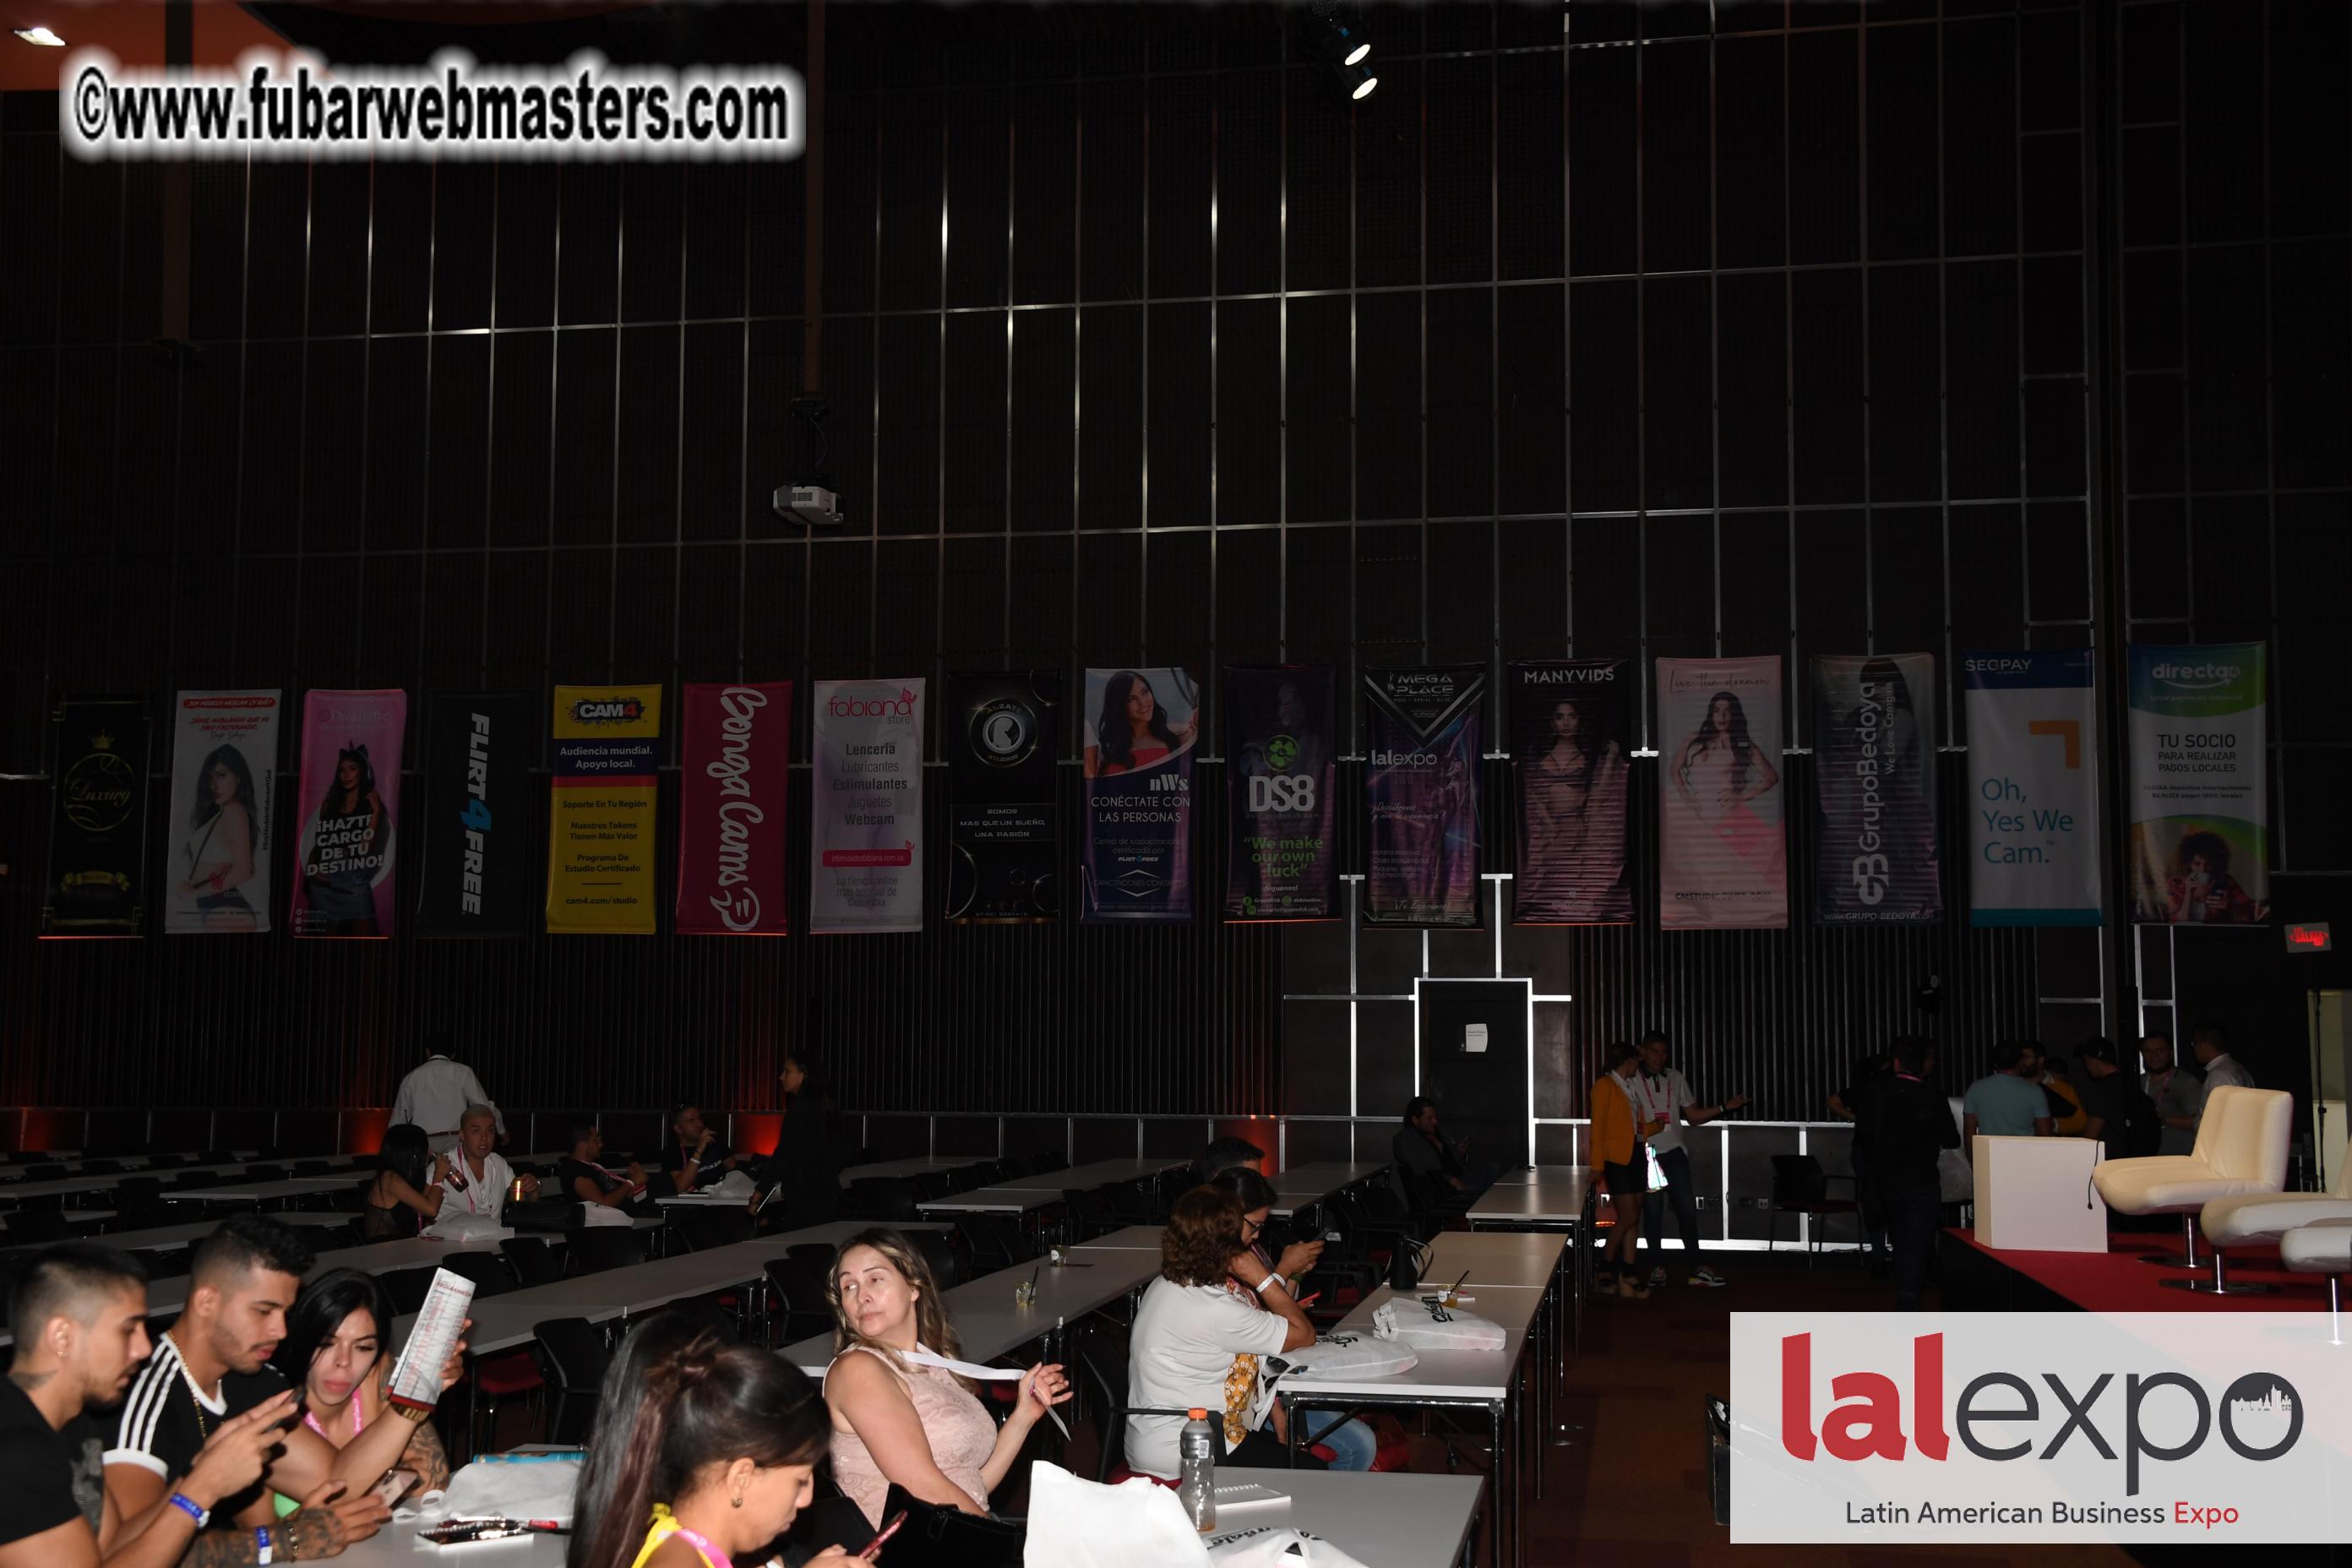 Seminars and Product Presentations